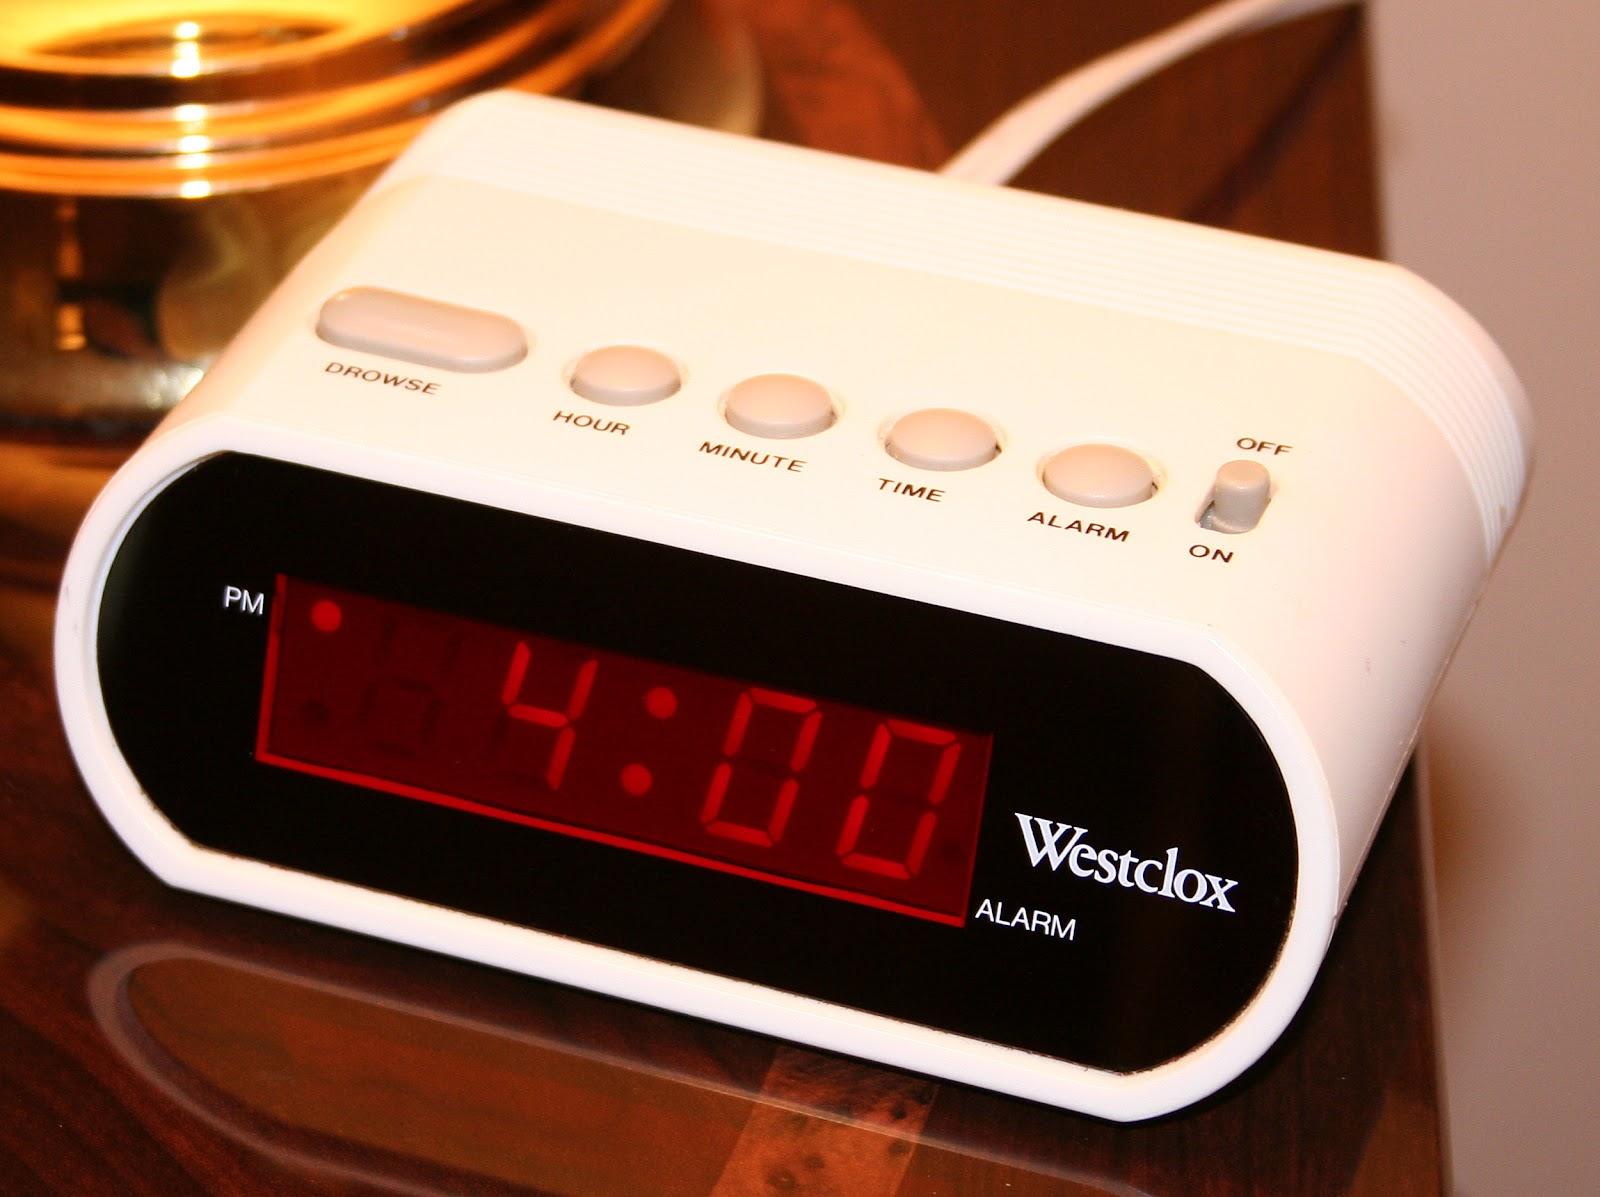 Basic digital alarm clock